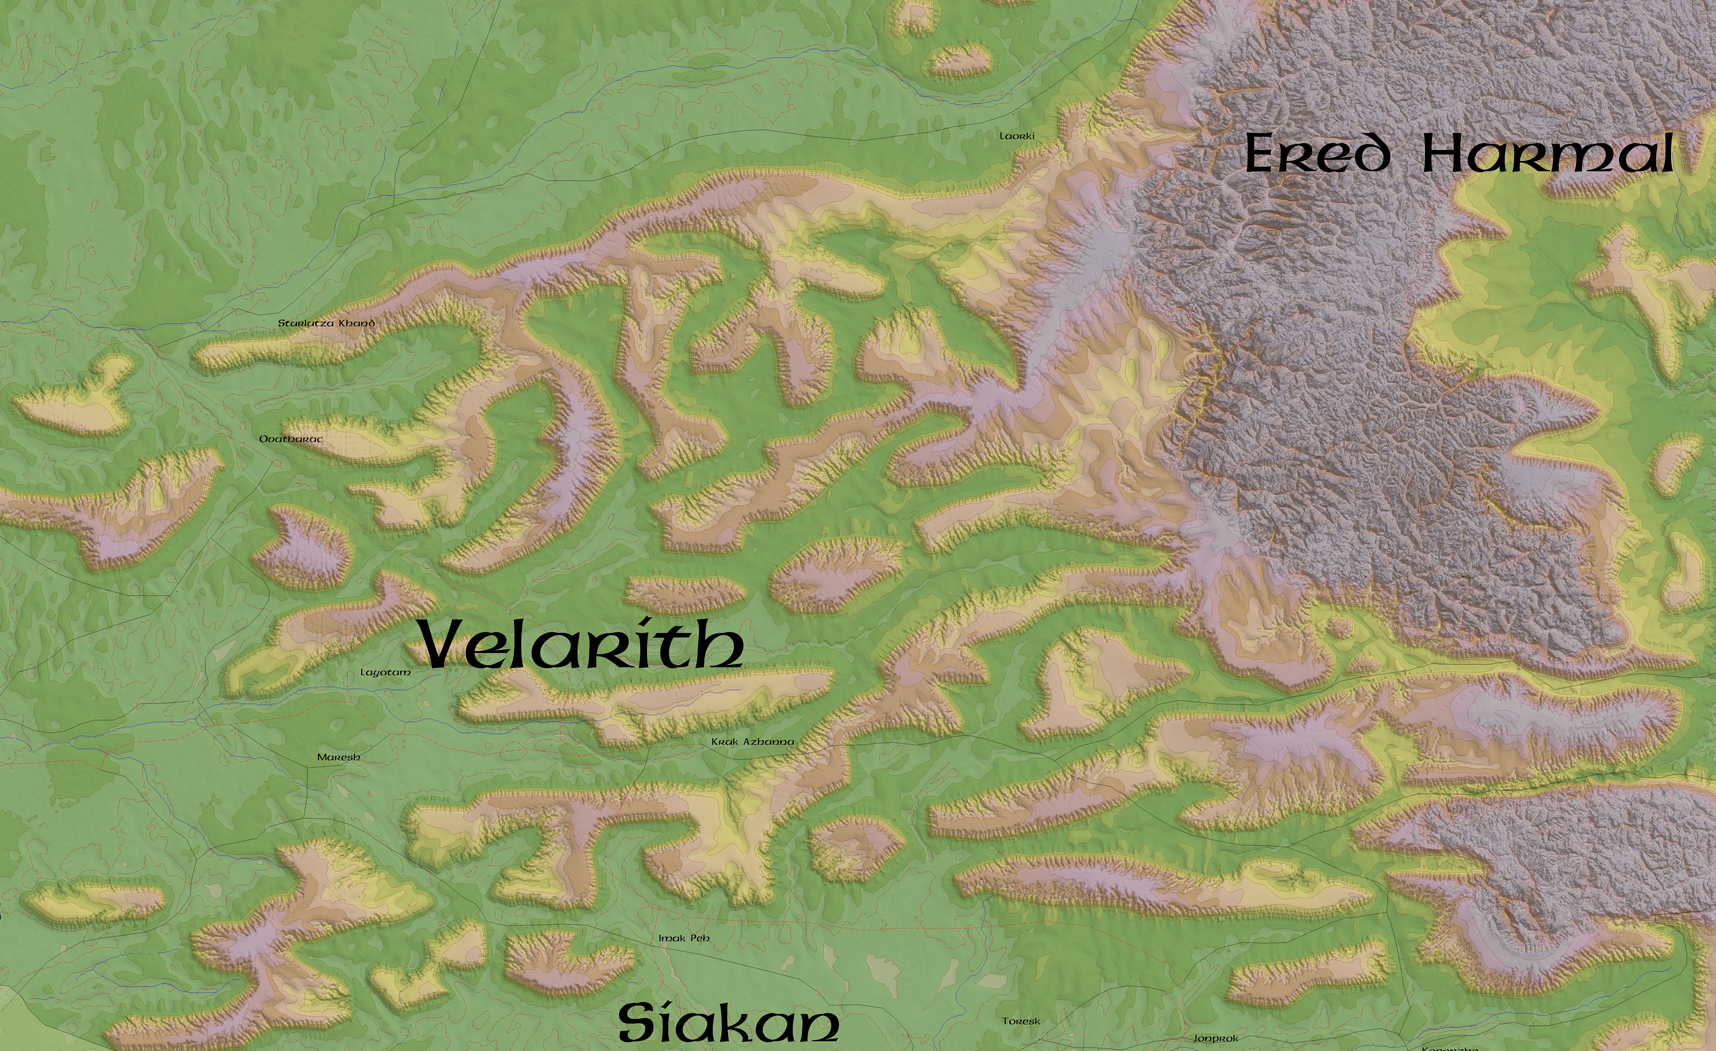 Velarith